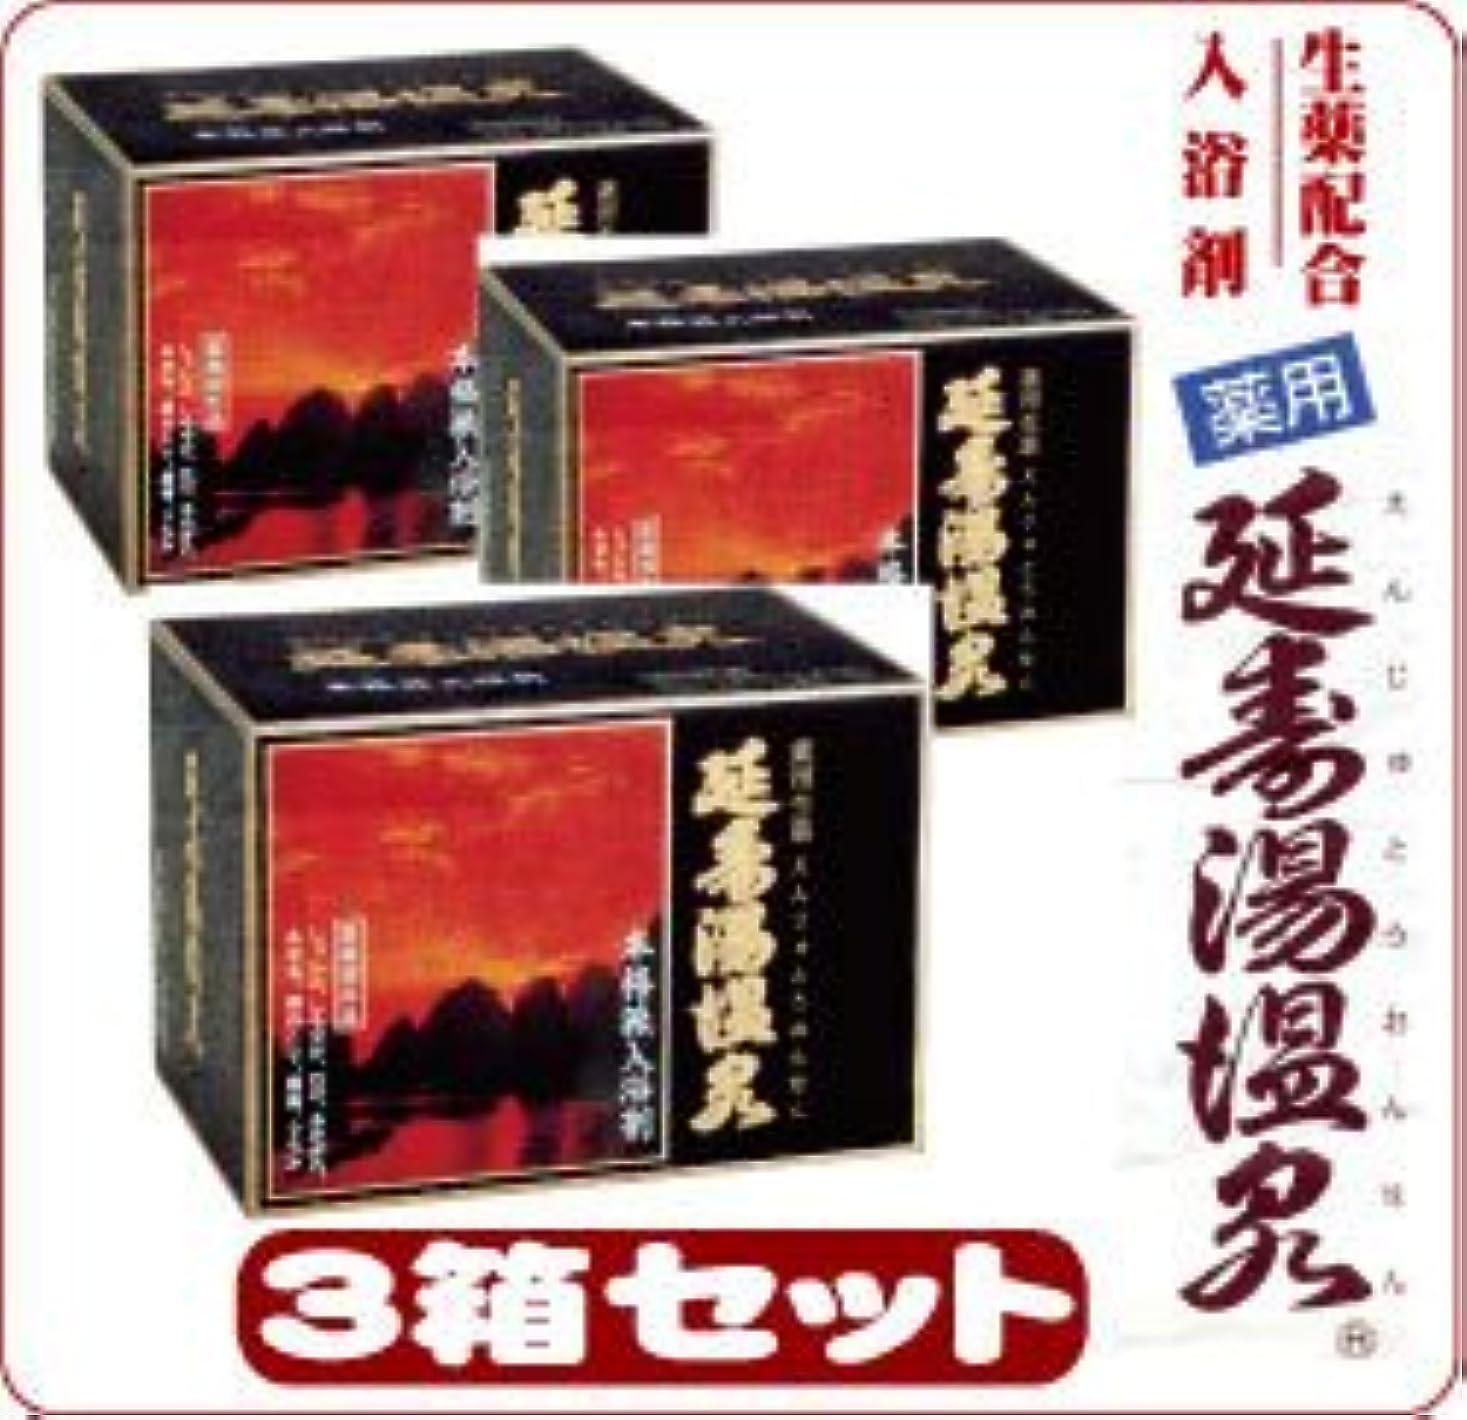 階層羊粉砕する【薬用入浴剤】  延寿湯温泉 50gX12包み 3箱セット  【天然生薬配合】